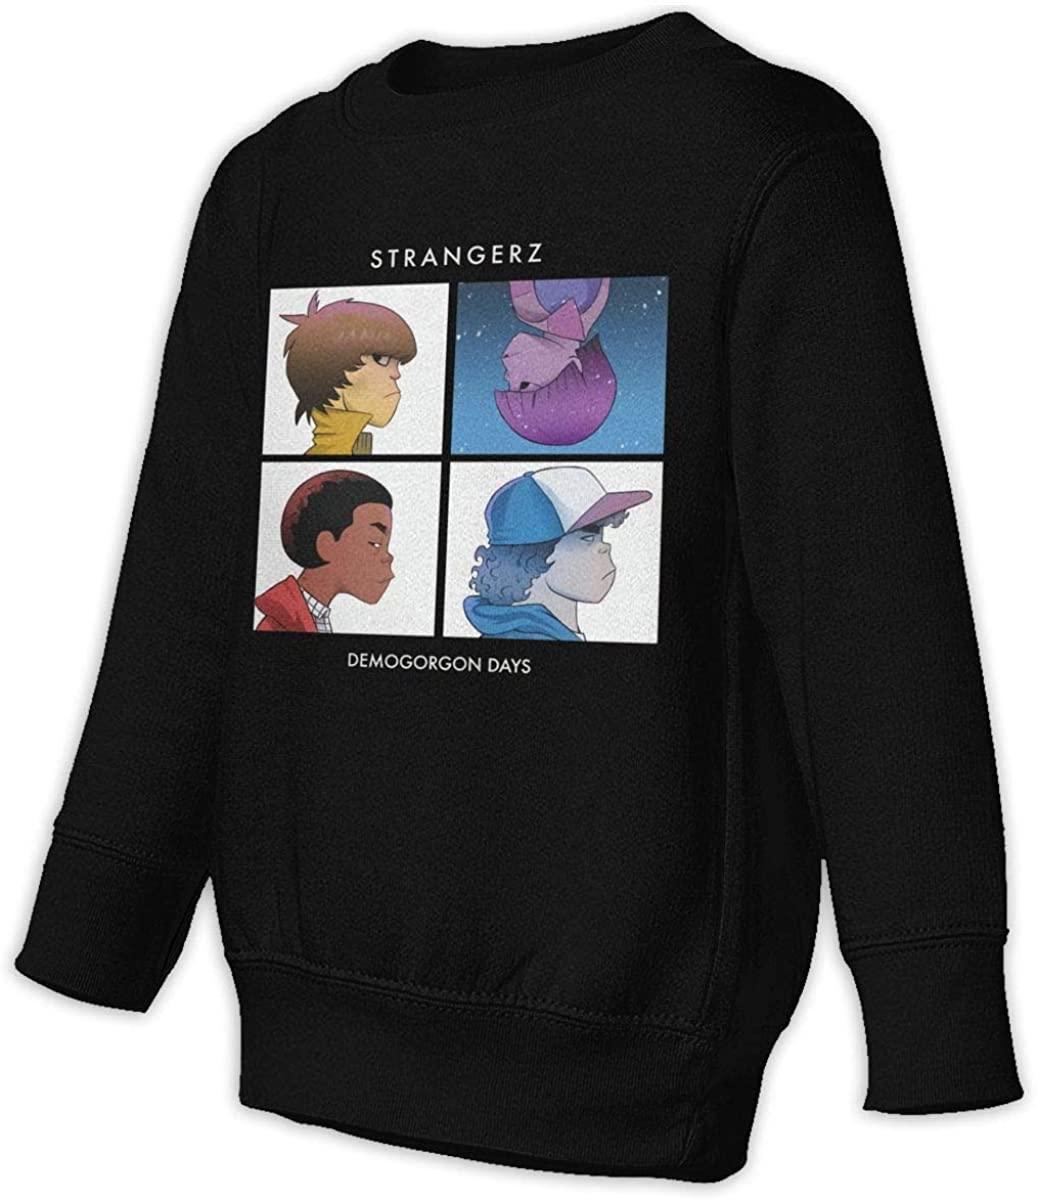 Nostalgiaz Unique Design Unisex Sweatshirt Youth Boy and Girls Pullover Sweatshirt Black